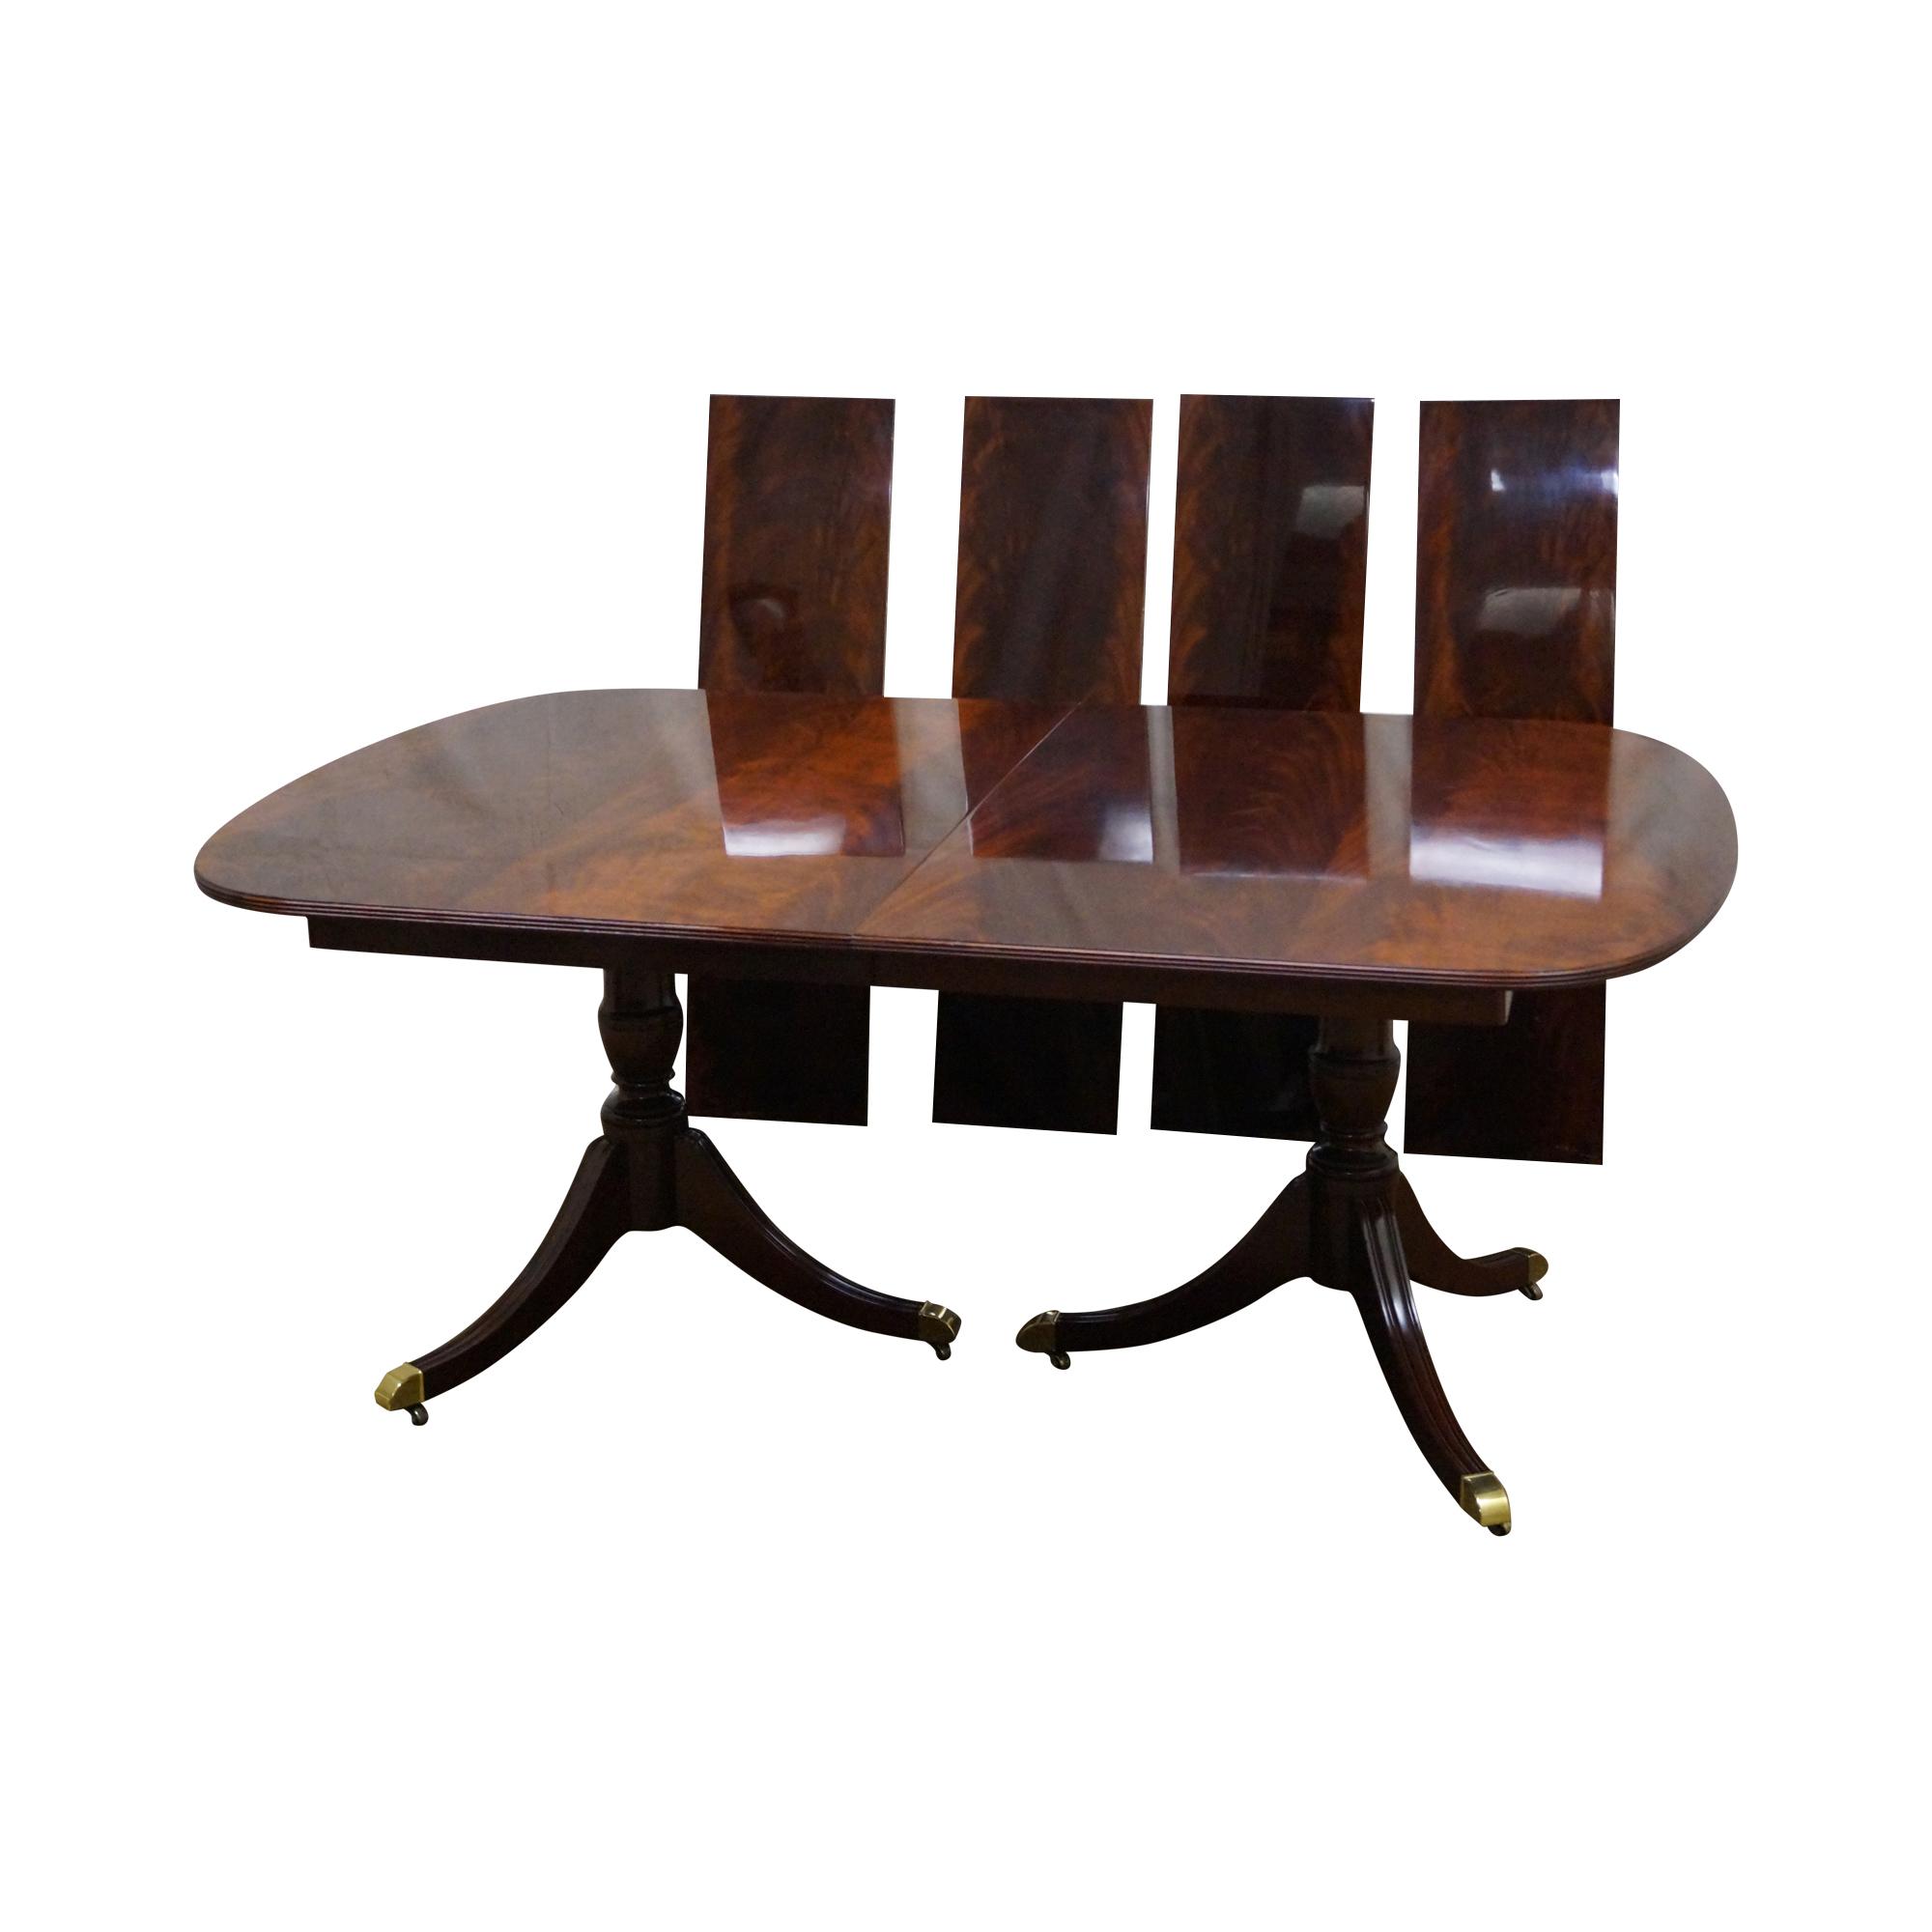 Kindel Flame Mahogany Duncan Phyfe Dining Table Chairish : 5253c4b0 5873 48f3 beab c065724ac000aspectfitampwidth640ampheight640 from www.chairish.com size 640 x 640 jpeg 24kB